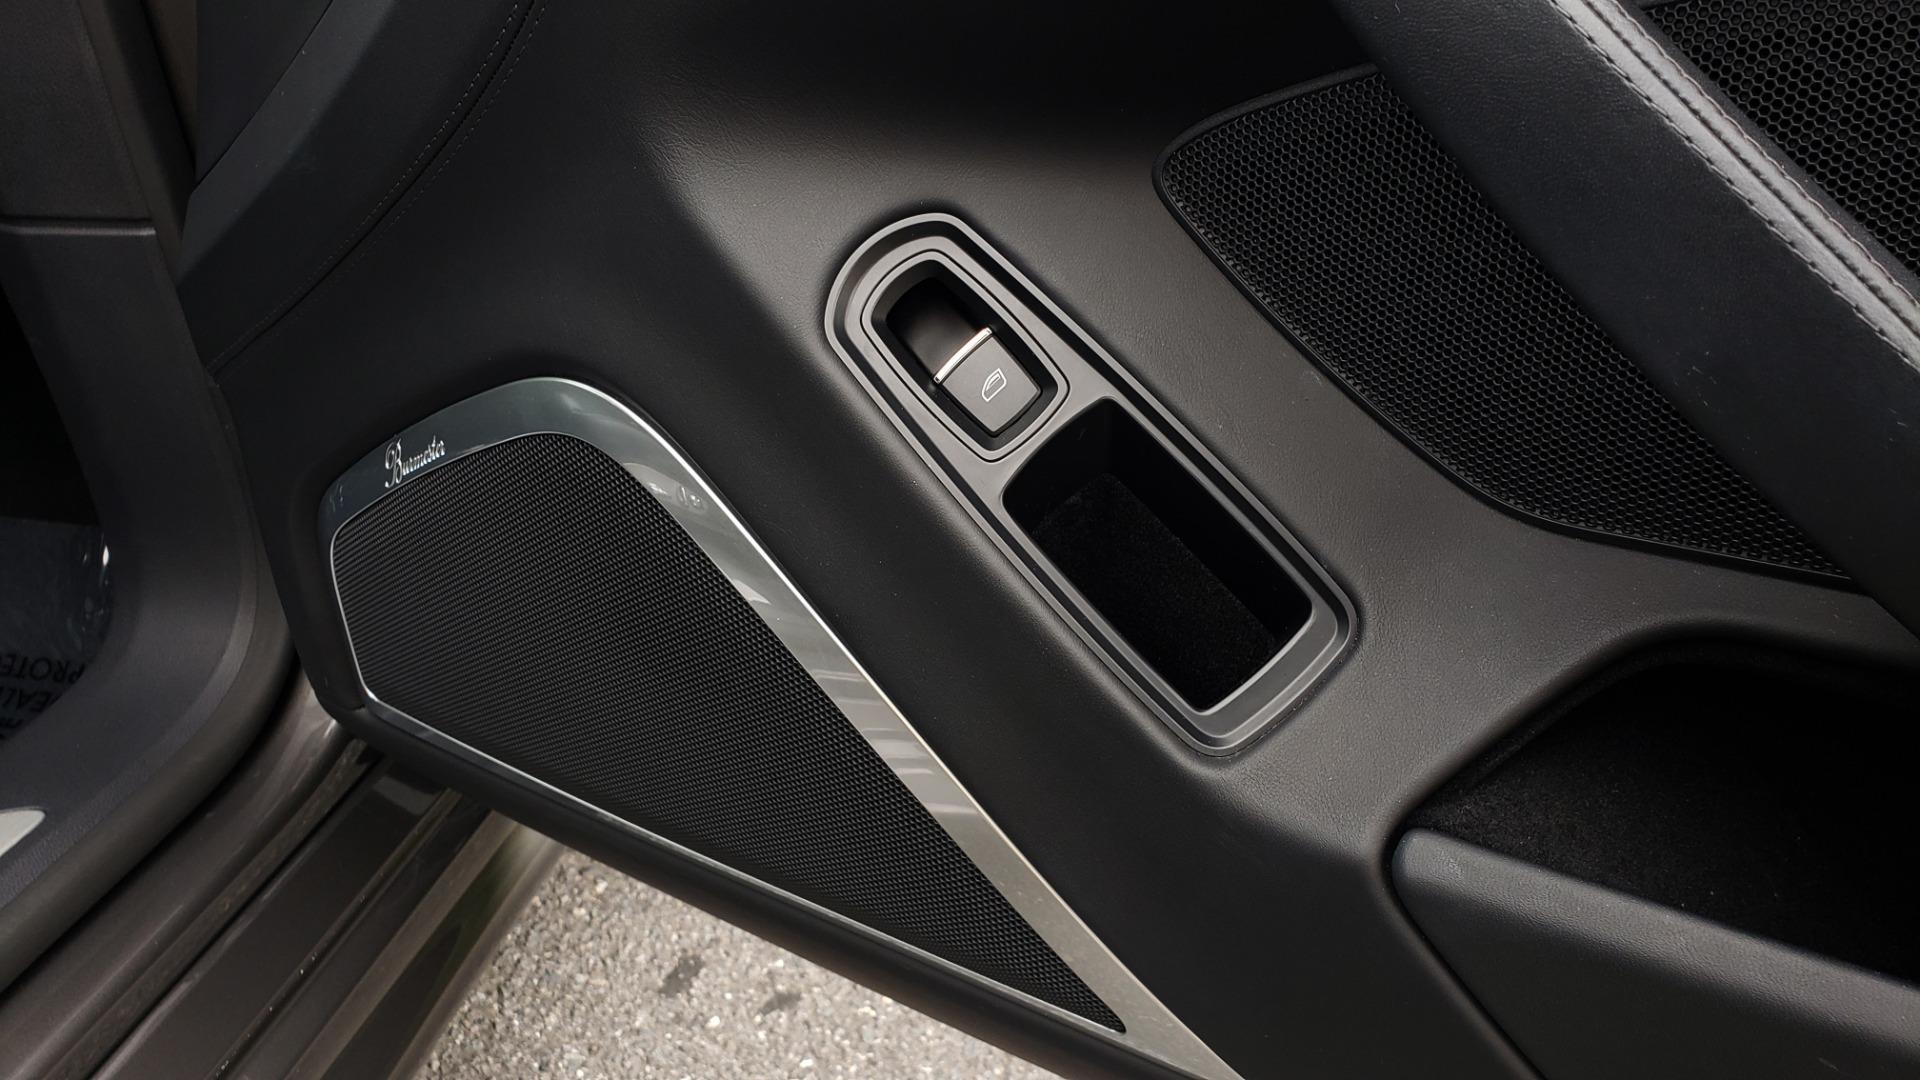 Used 2013 Porsche PANAMERA TURBO 4.8L V8 / AWD / NAV / SUNROOF / LCA / PARK ASST / BURMESTER for sale $45,995 at Formula Imports in Charlotte NC 28227 70